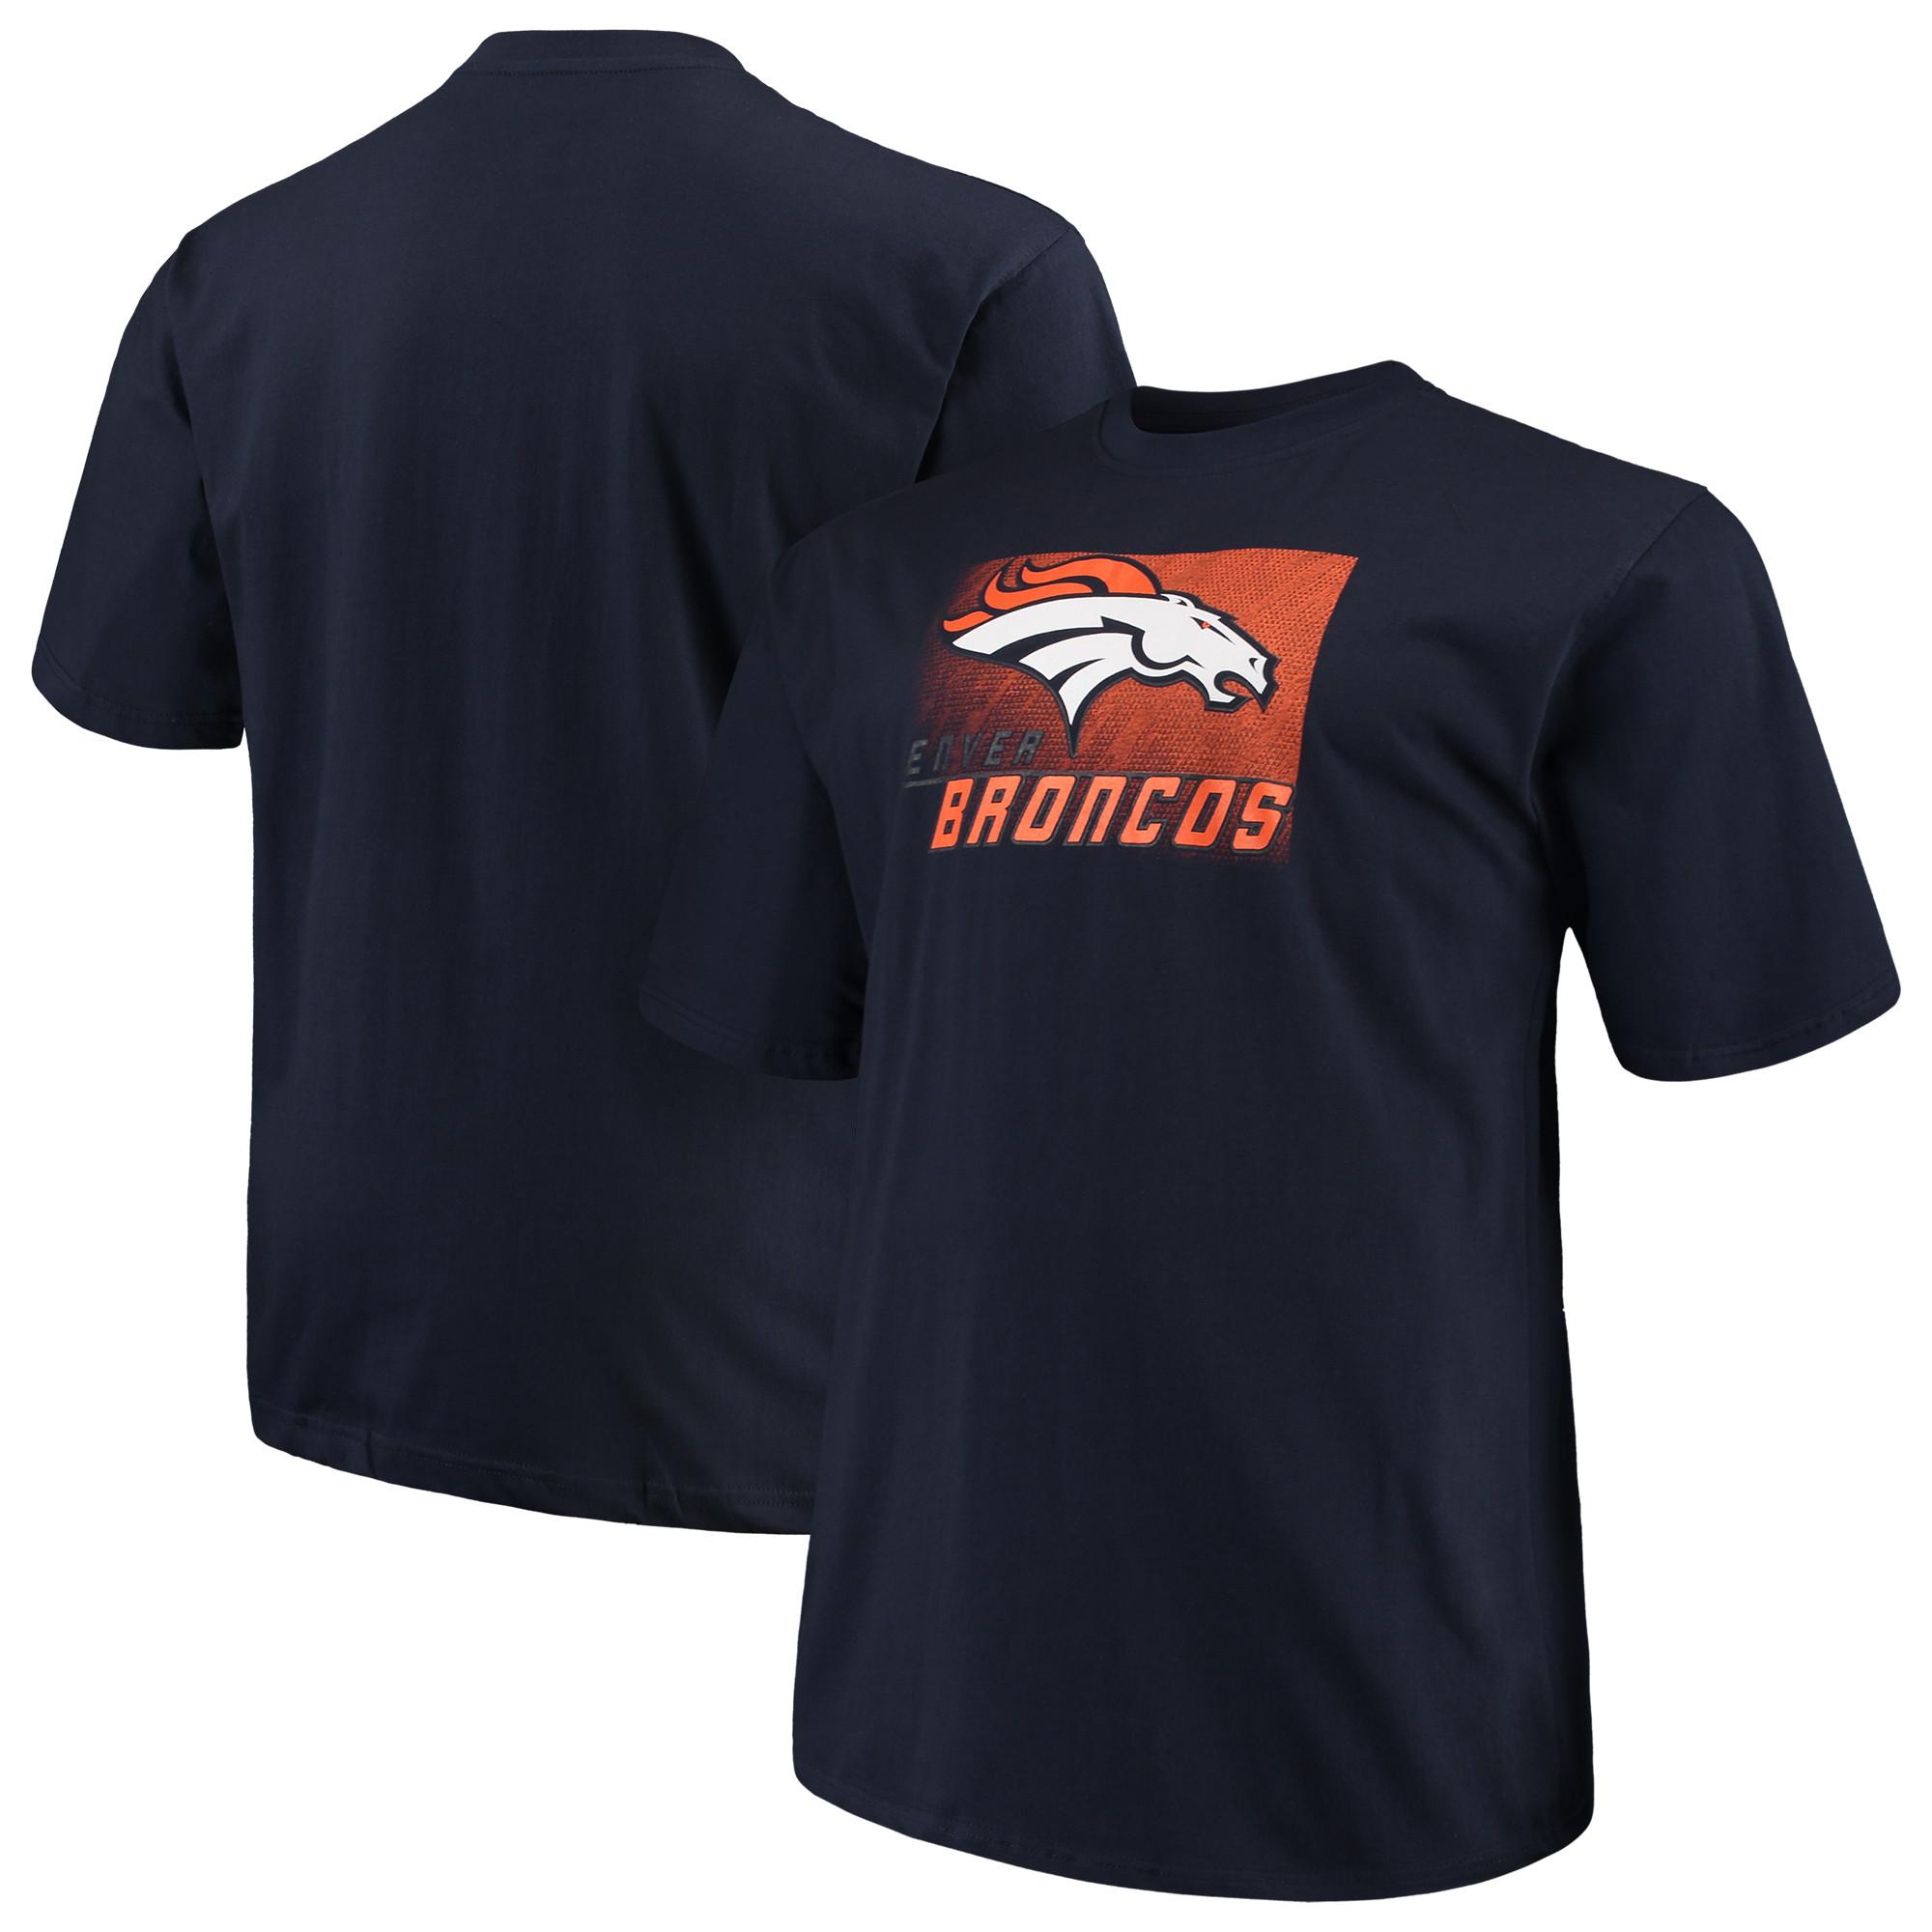 Men's Majestic Navy Denver Broncos Big & Tall Reflective T-Shirt